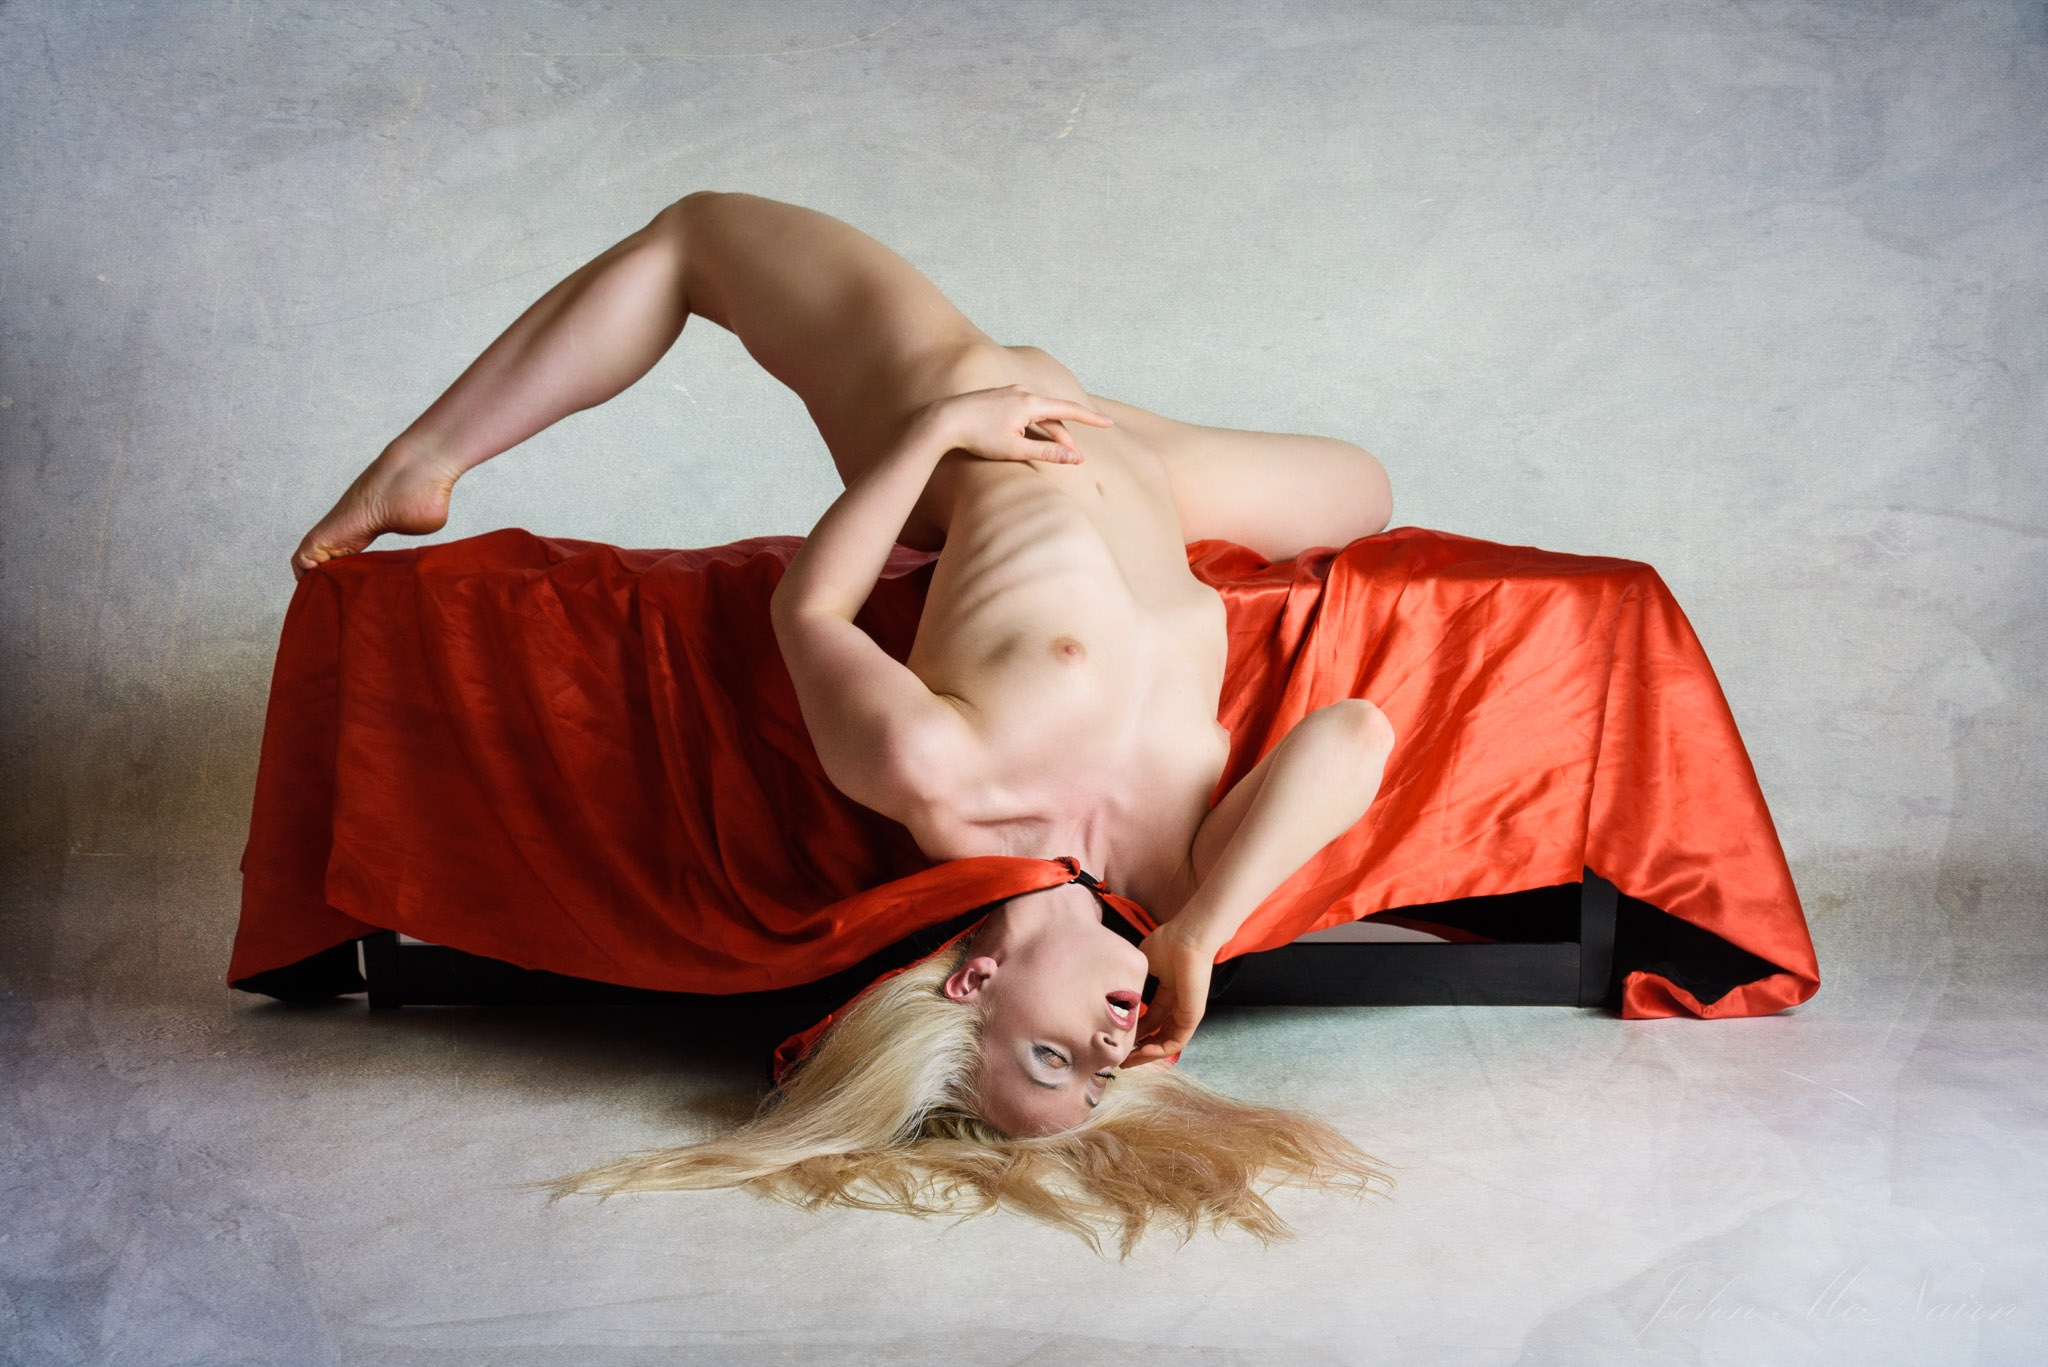 Keira Red by John McNairn